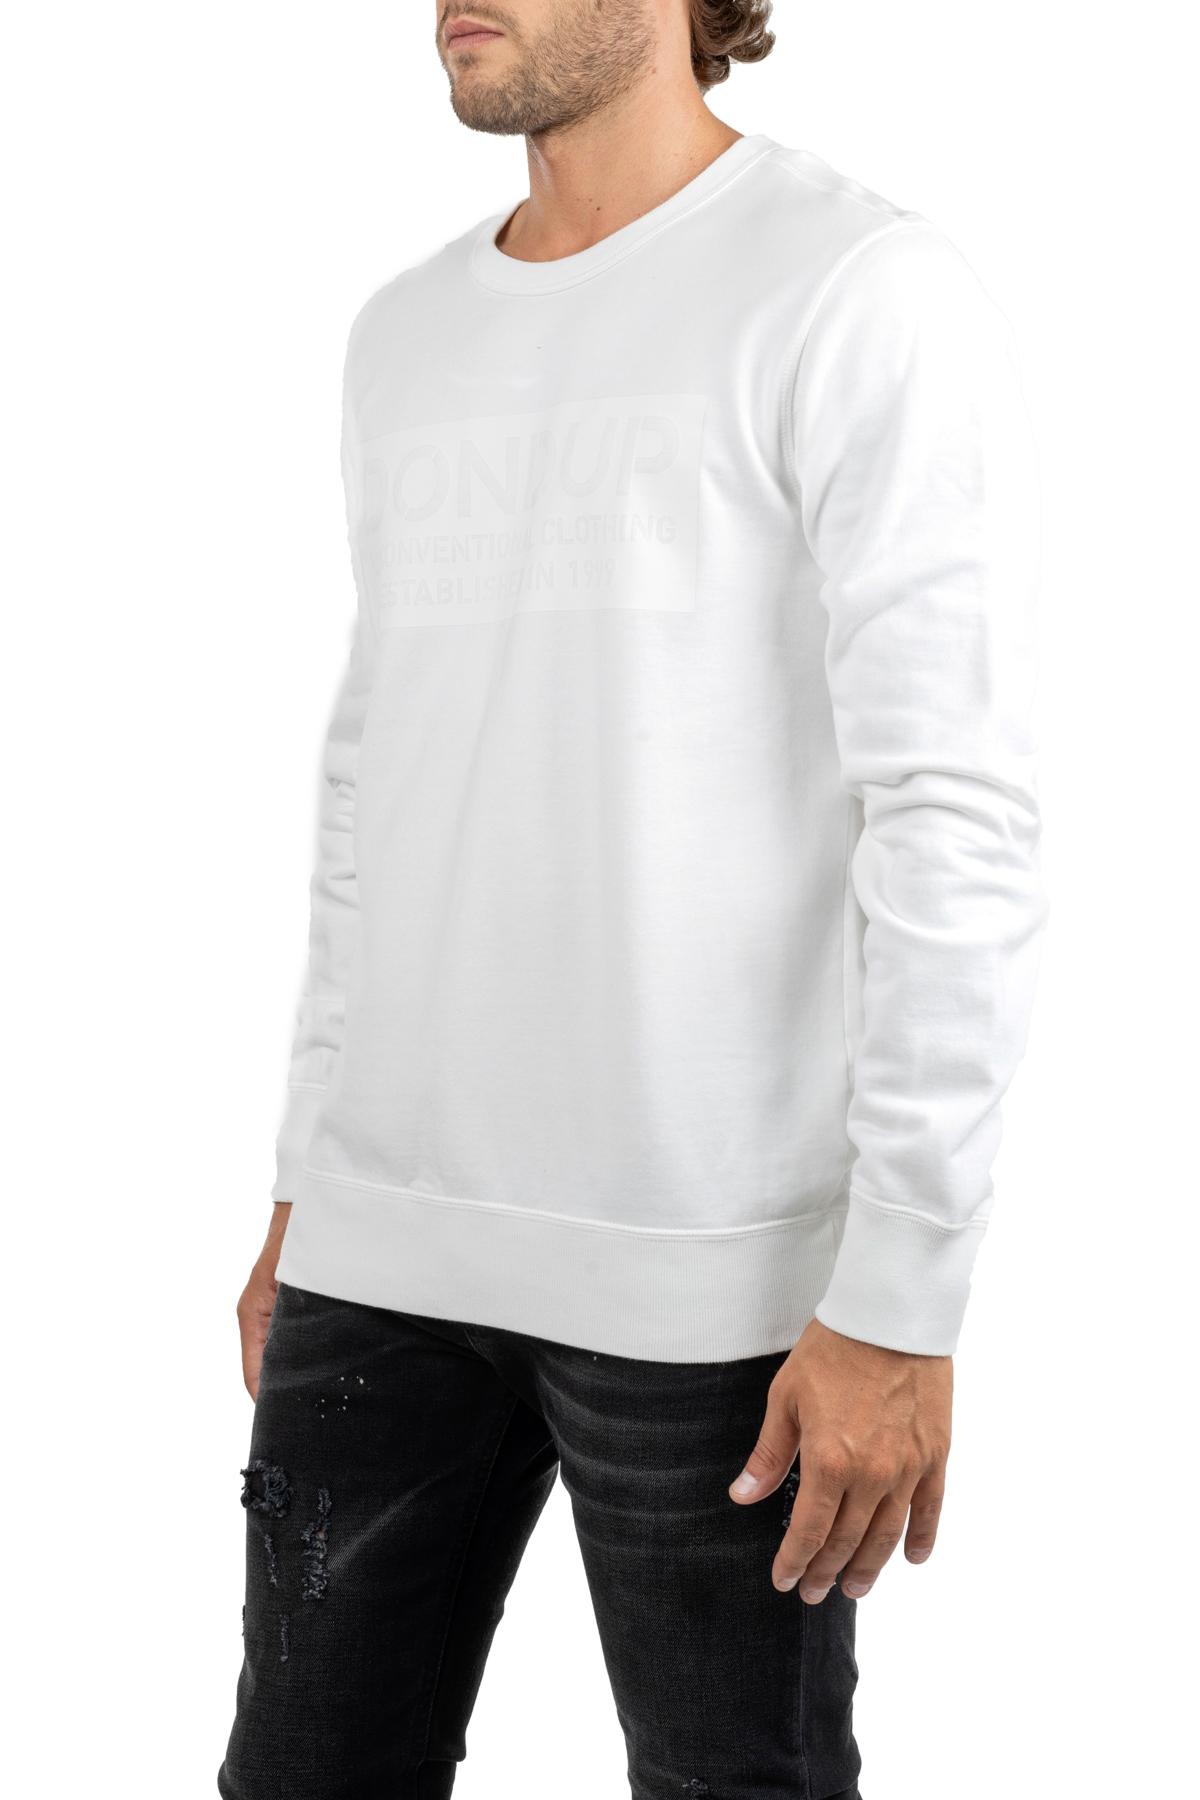 WHITE VEST WITH LOGO PRINT DONDUP | Sweatshirts | UF515KF0153I89DUW19000